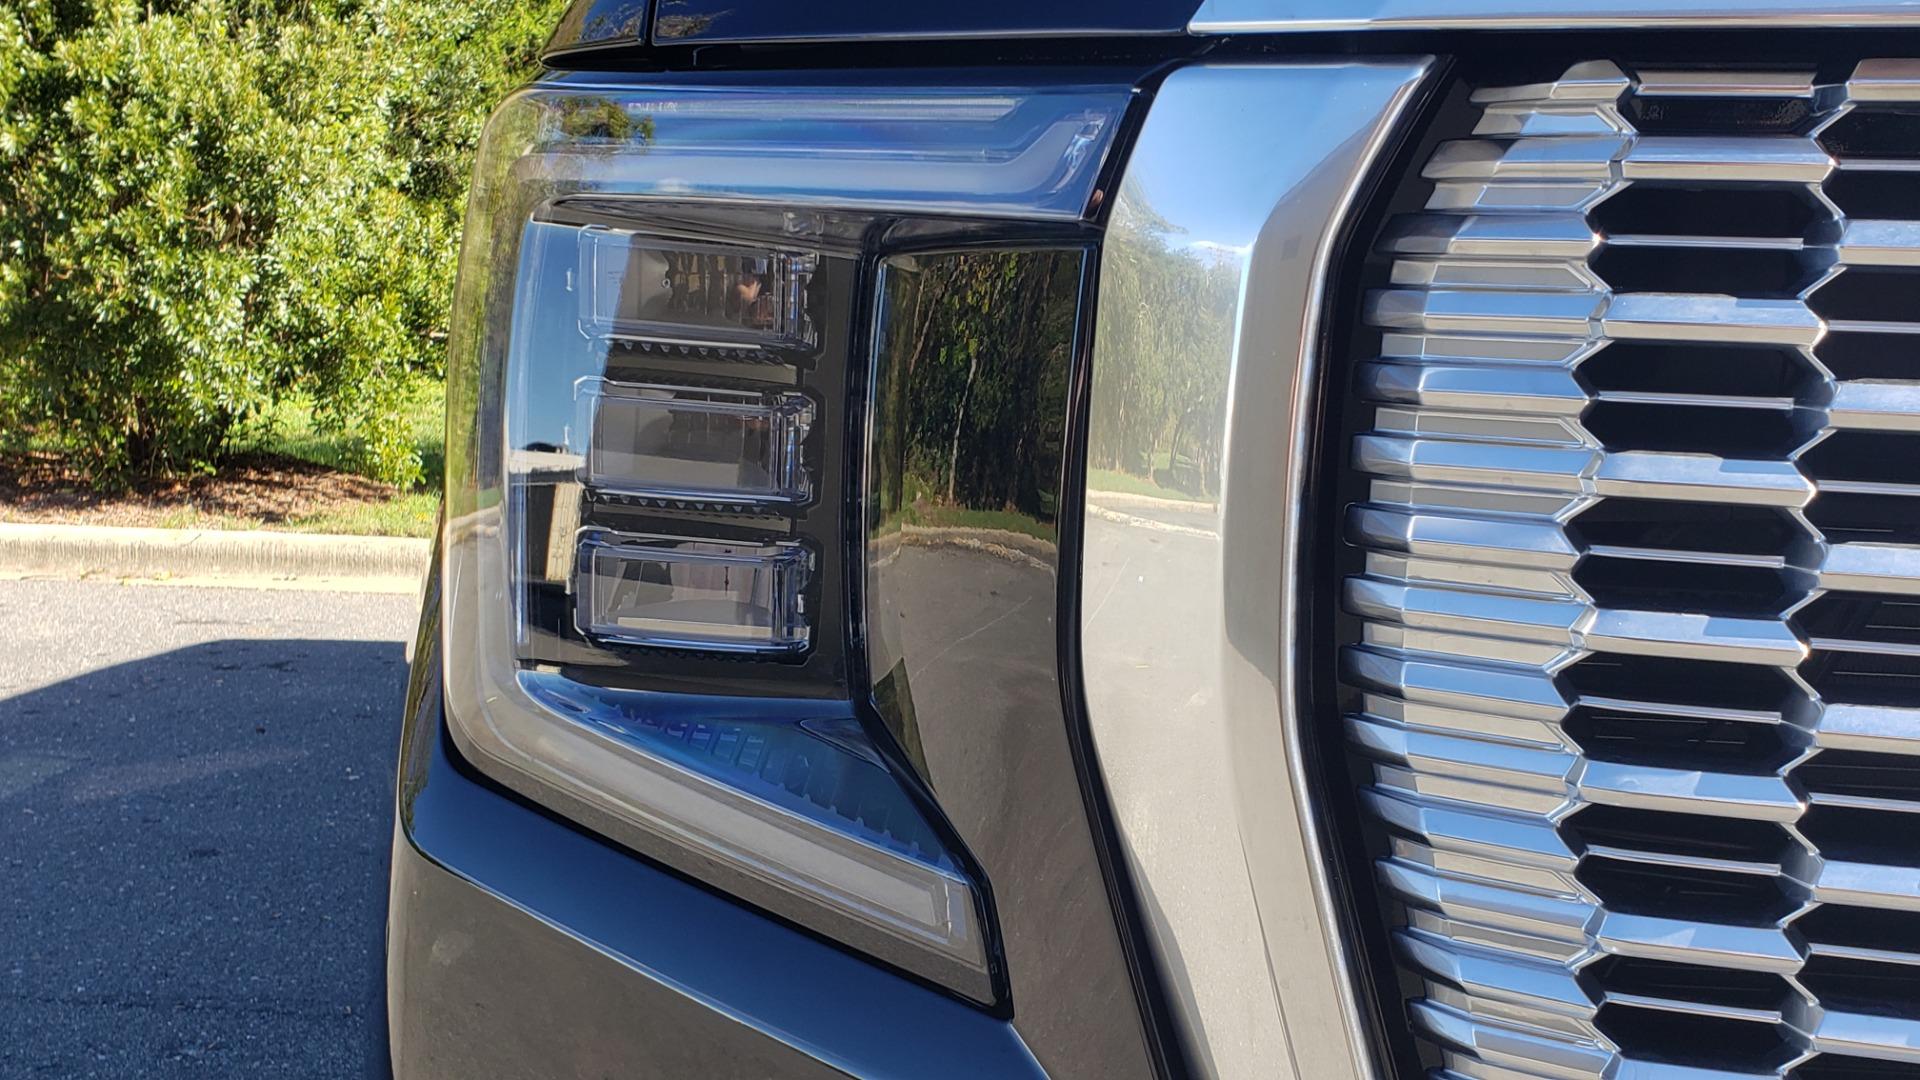 Used 2021 GMC YUKON DENALI PREMIUM 4WD / NAV / ADVANCED TECH / ENTERTAINMENT for sale Sold at Formula Imports in Charlotte NC 28227 23